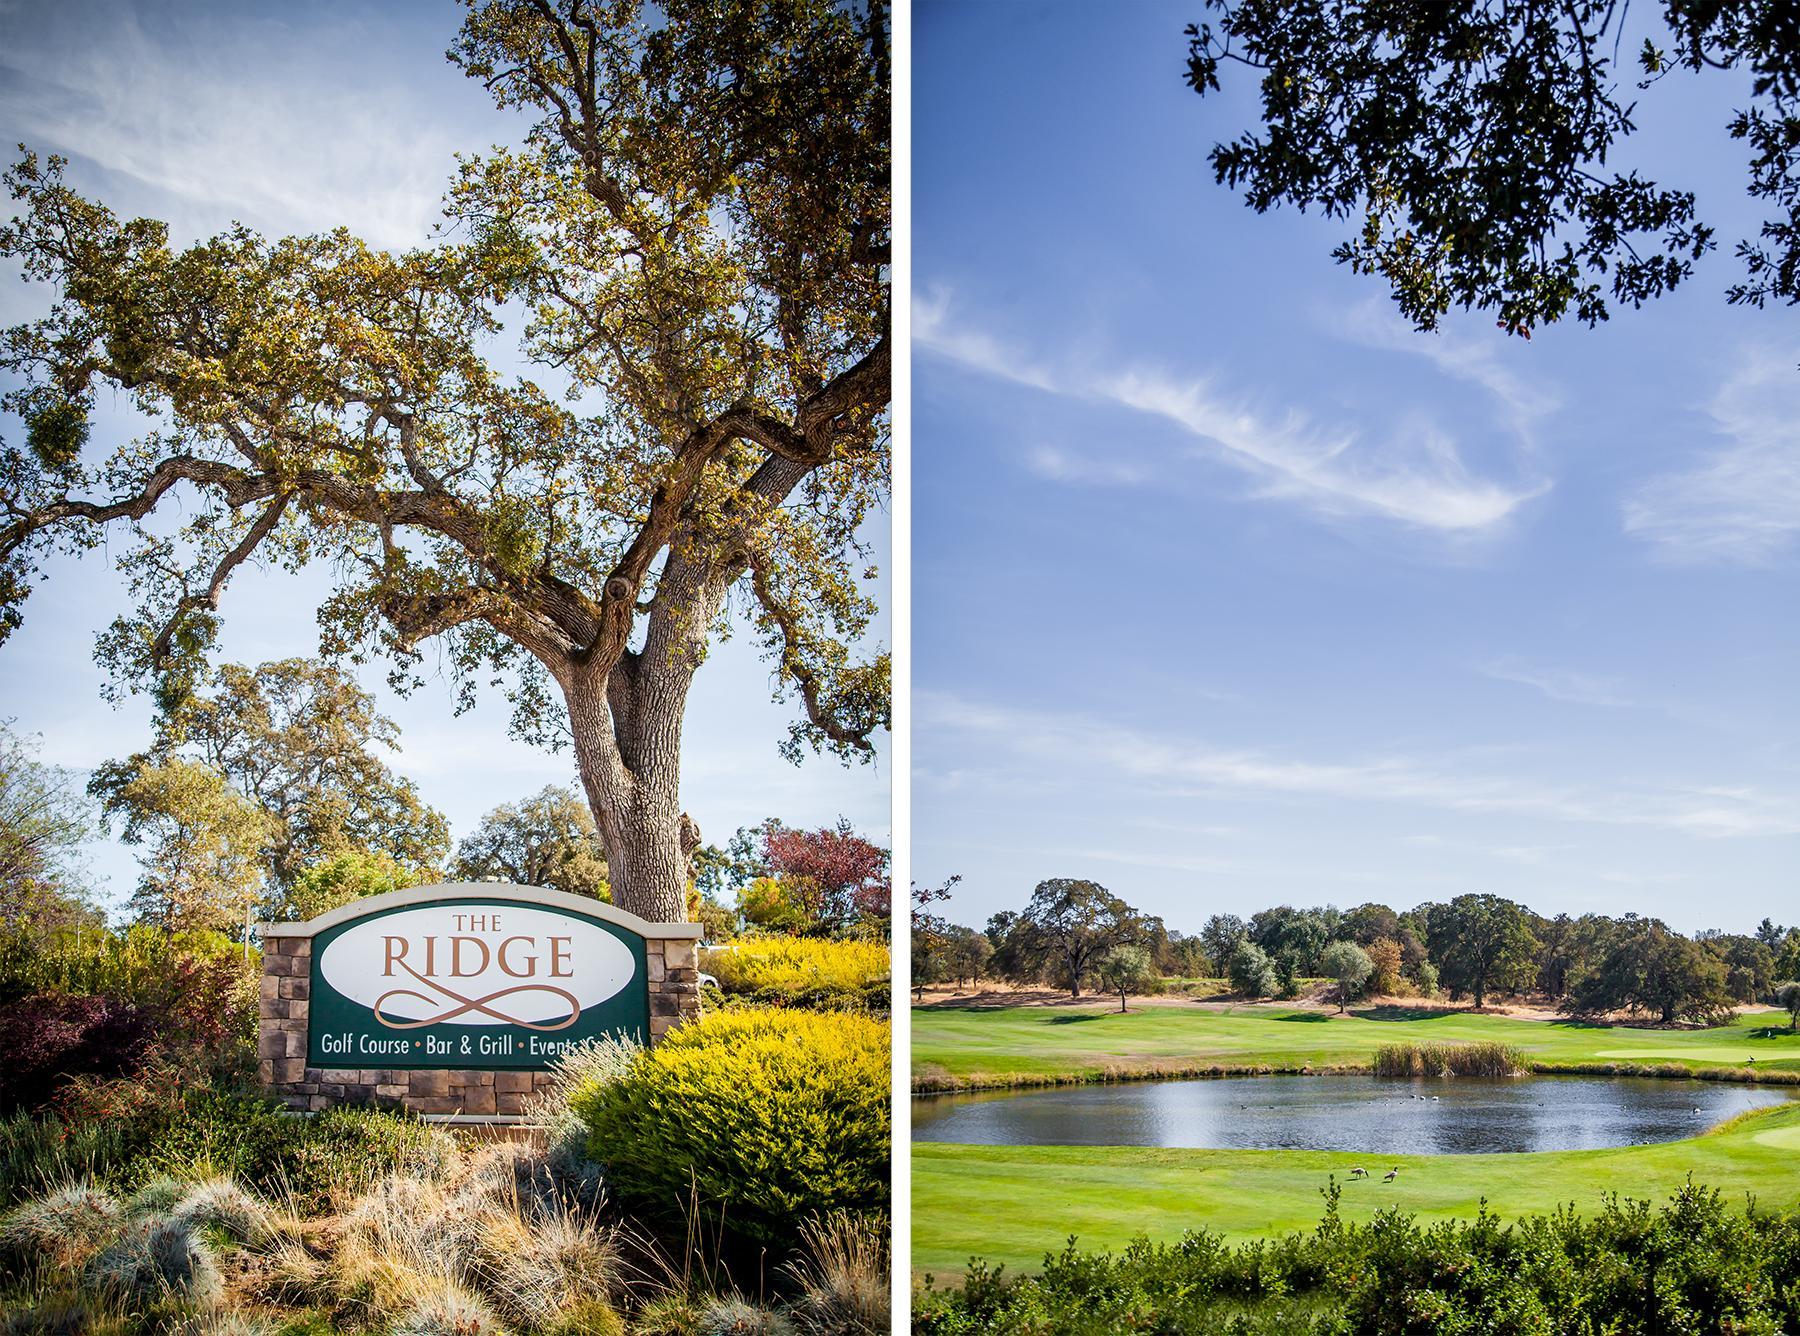 Twentieth Annual Charity Golf Tournament